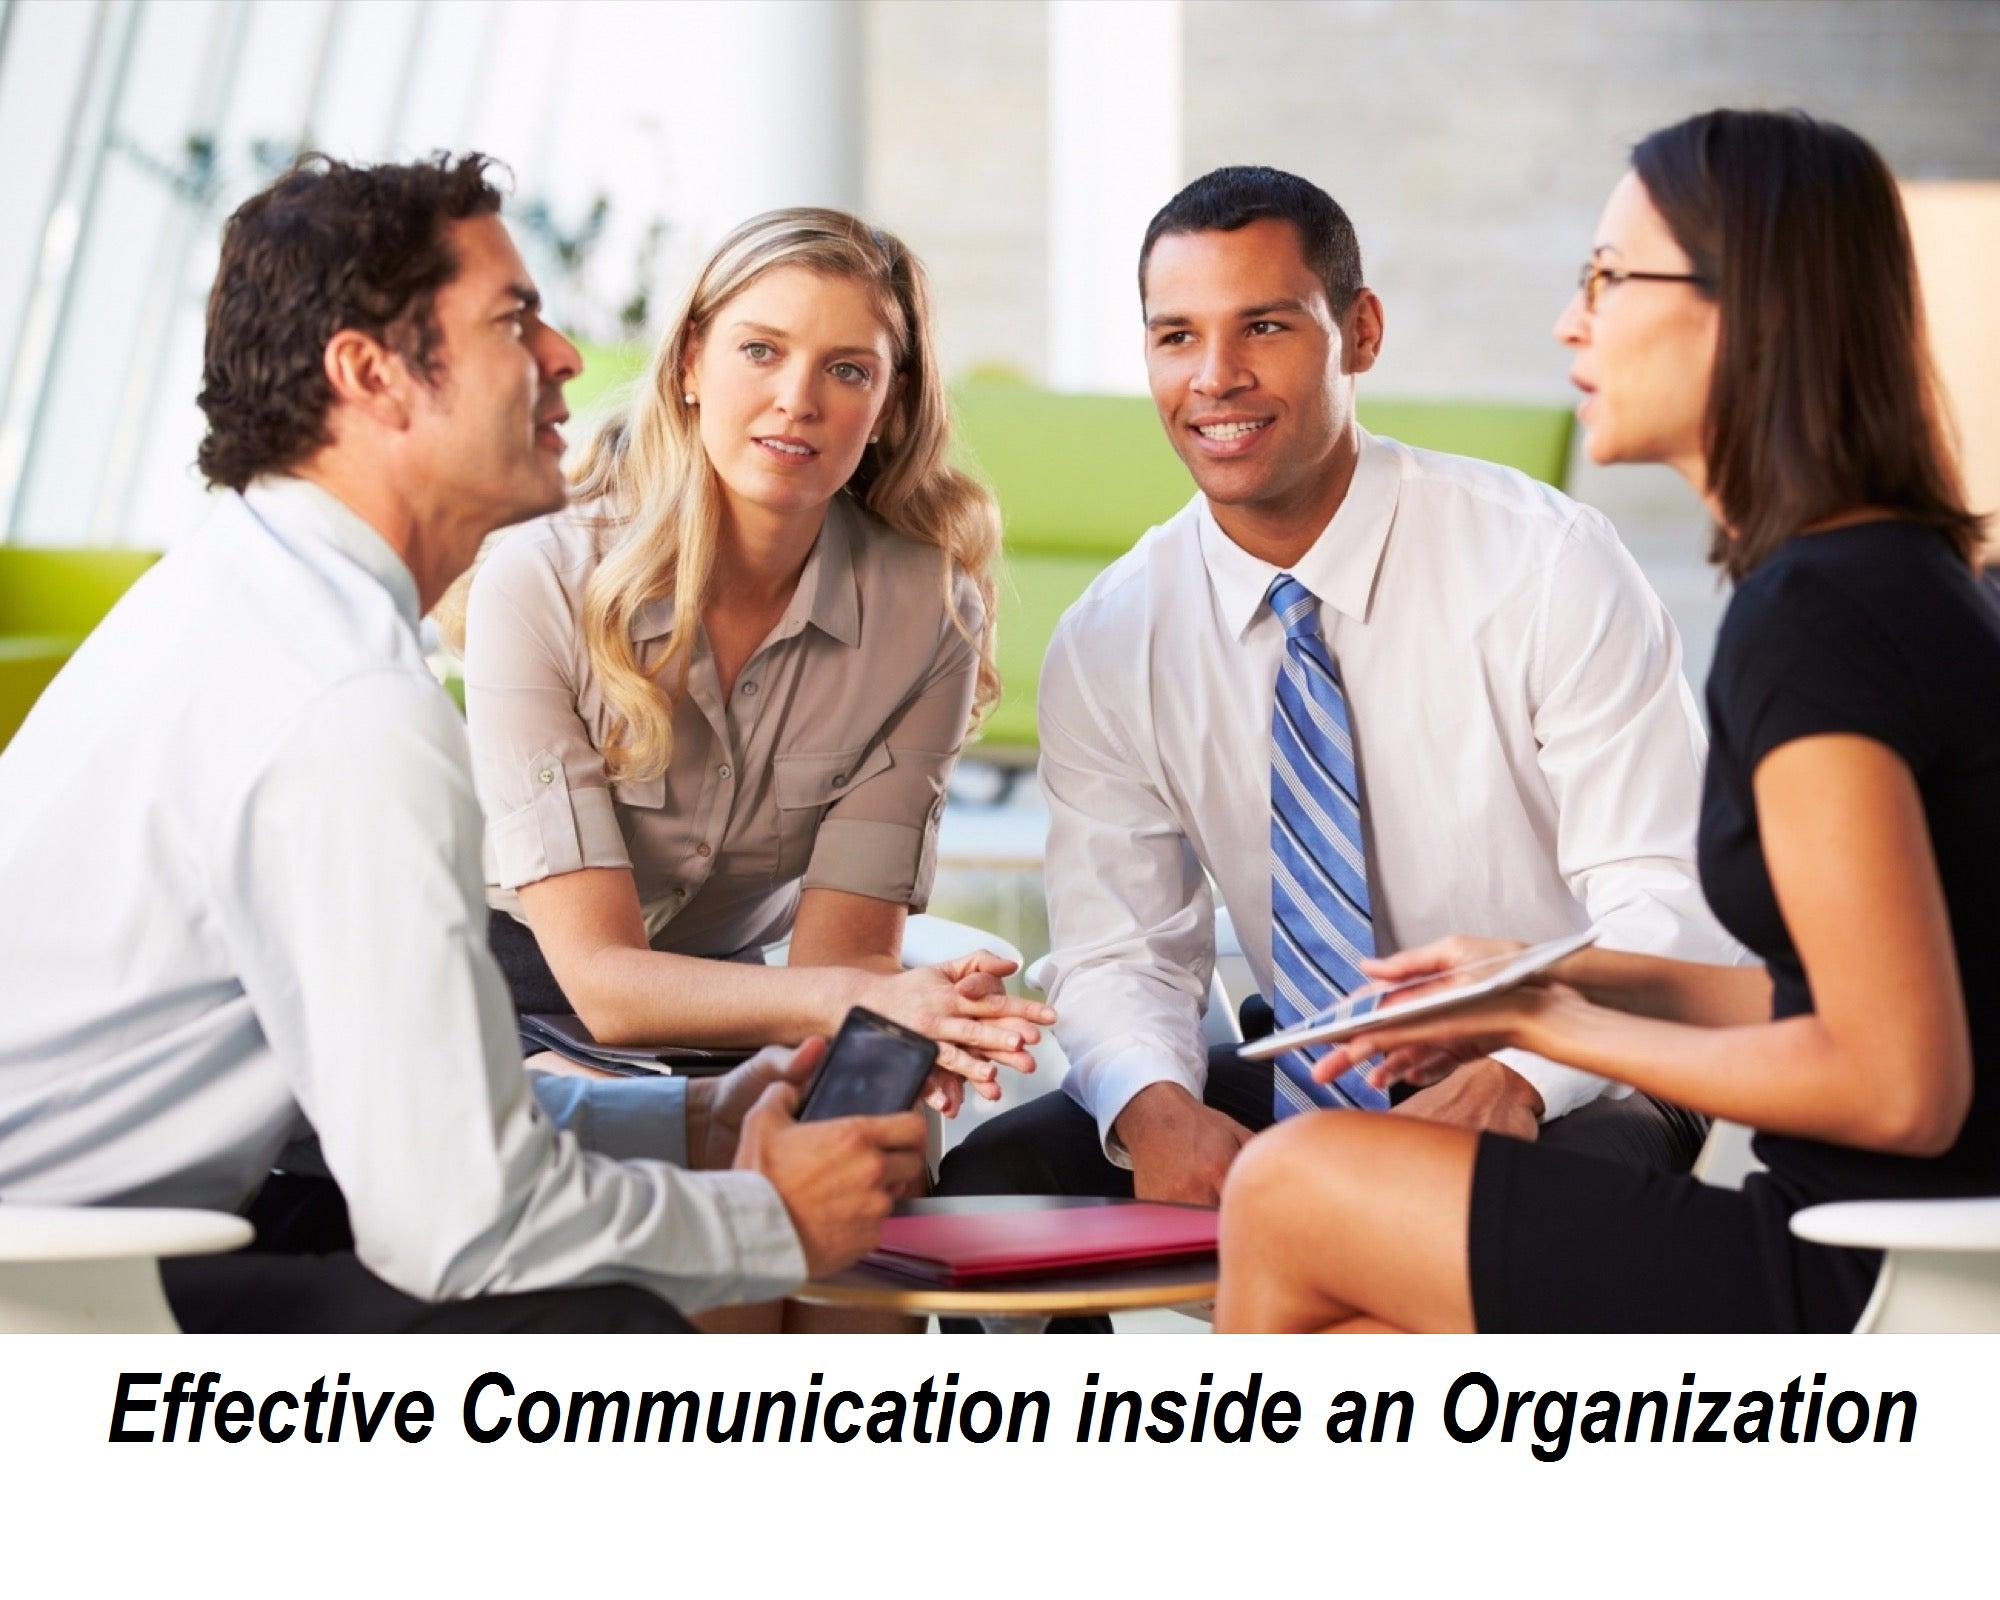 Effective Communication inside an Organization